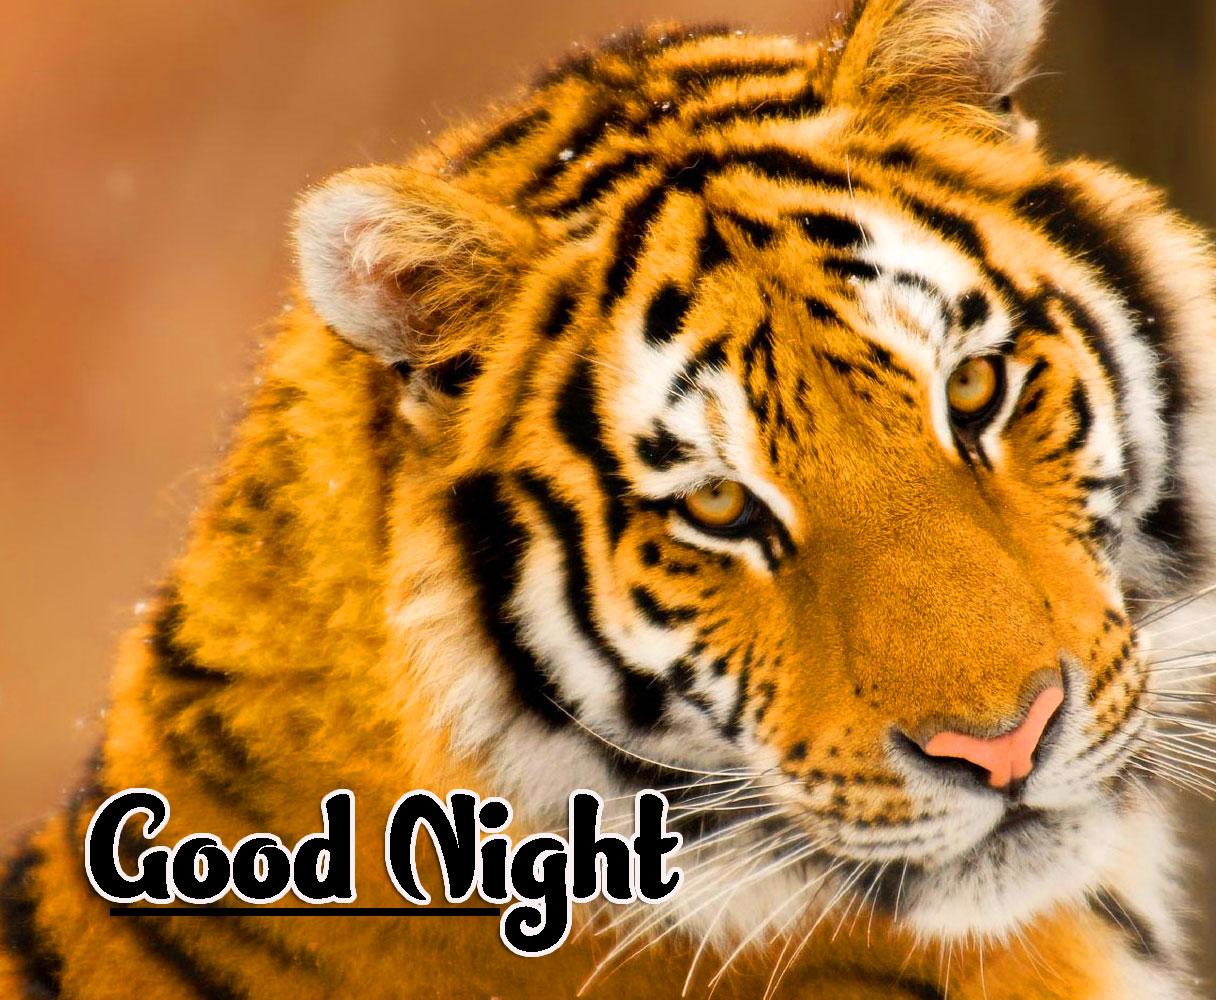 Cute Good Night Images Pics Wallpaper Download